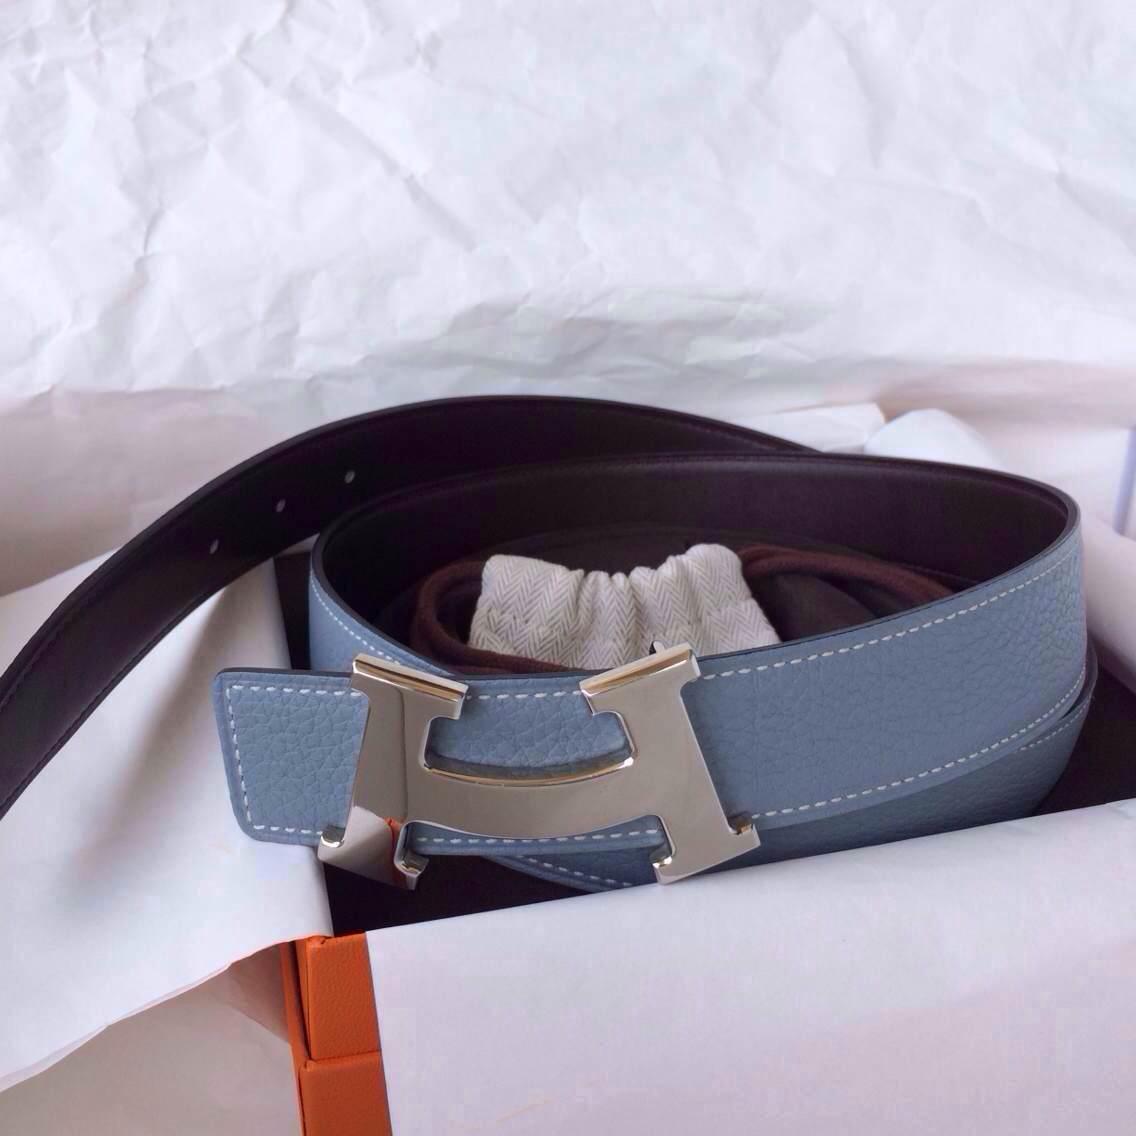 Hermes Two-sided Men's Belt J7 Blue Lin Togo Leather/Dark Coffee Box Leather 32mm Width